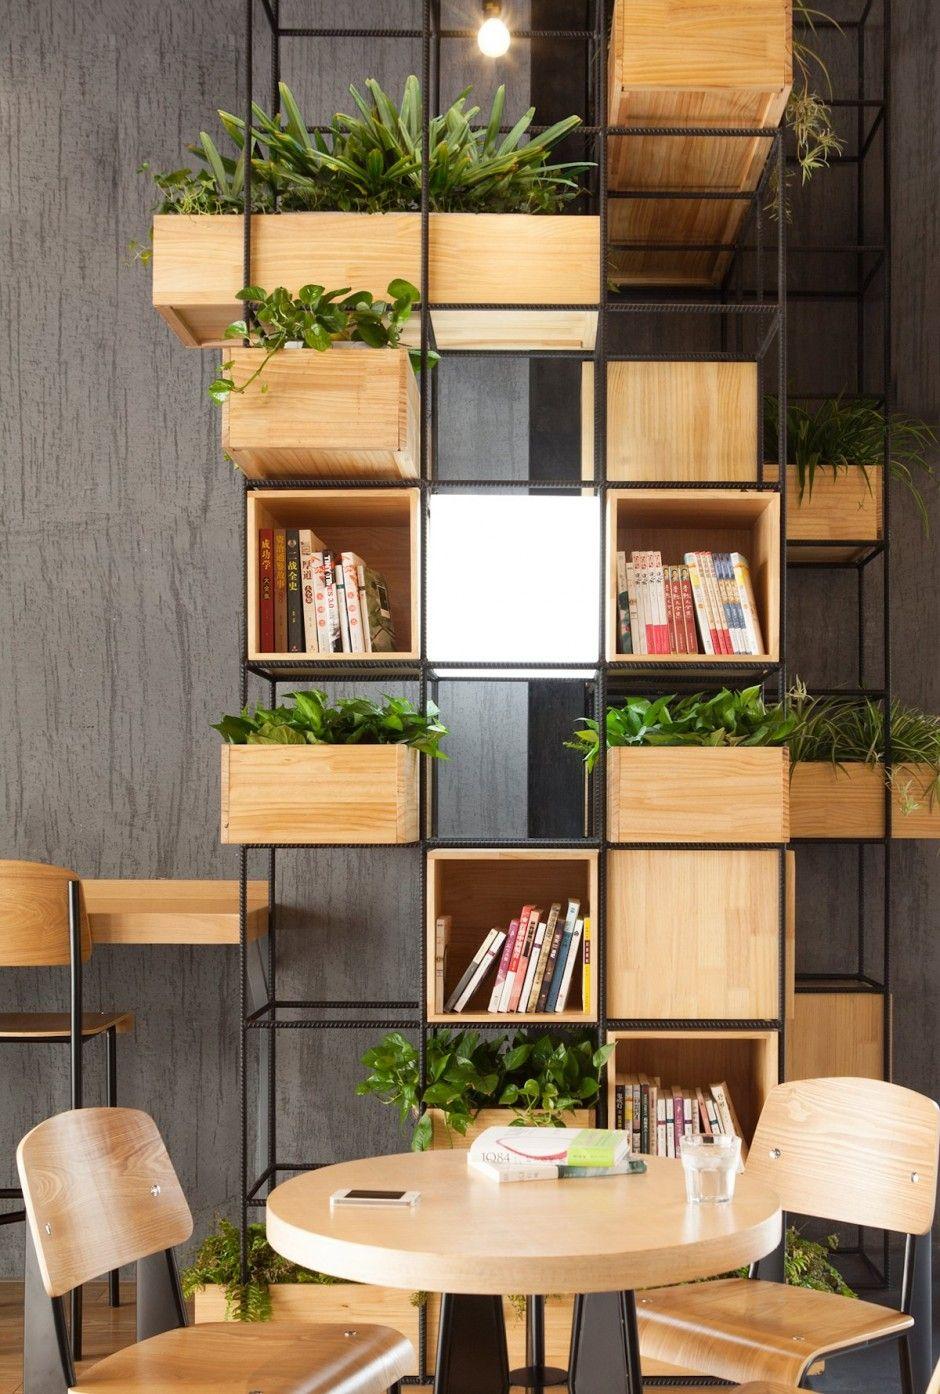 Green plants in shelves via contemporist hc 植物plants